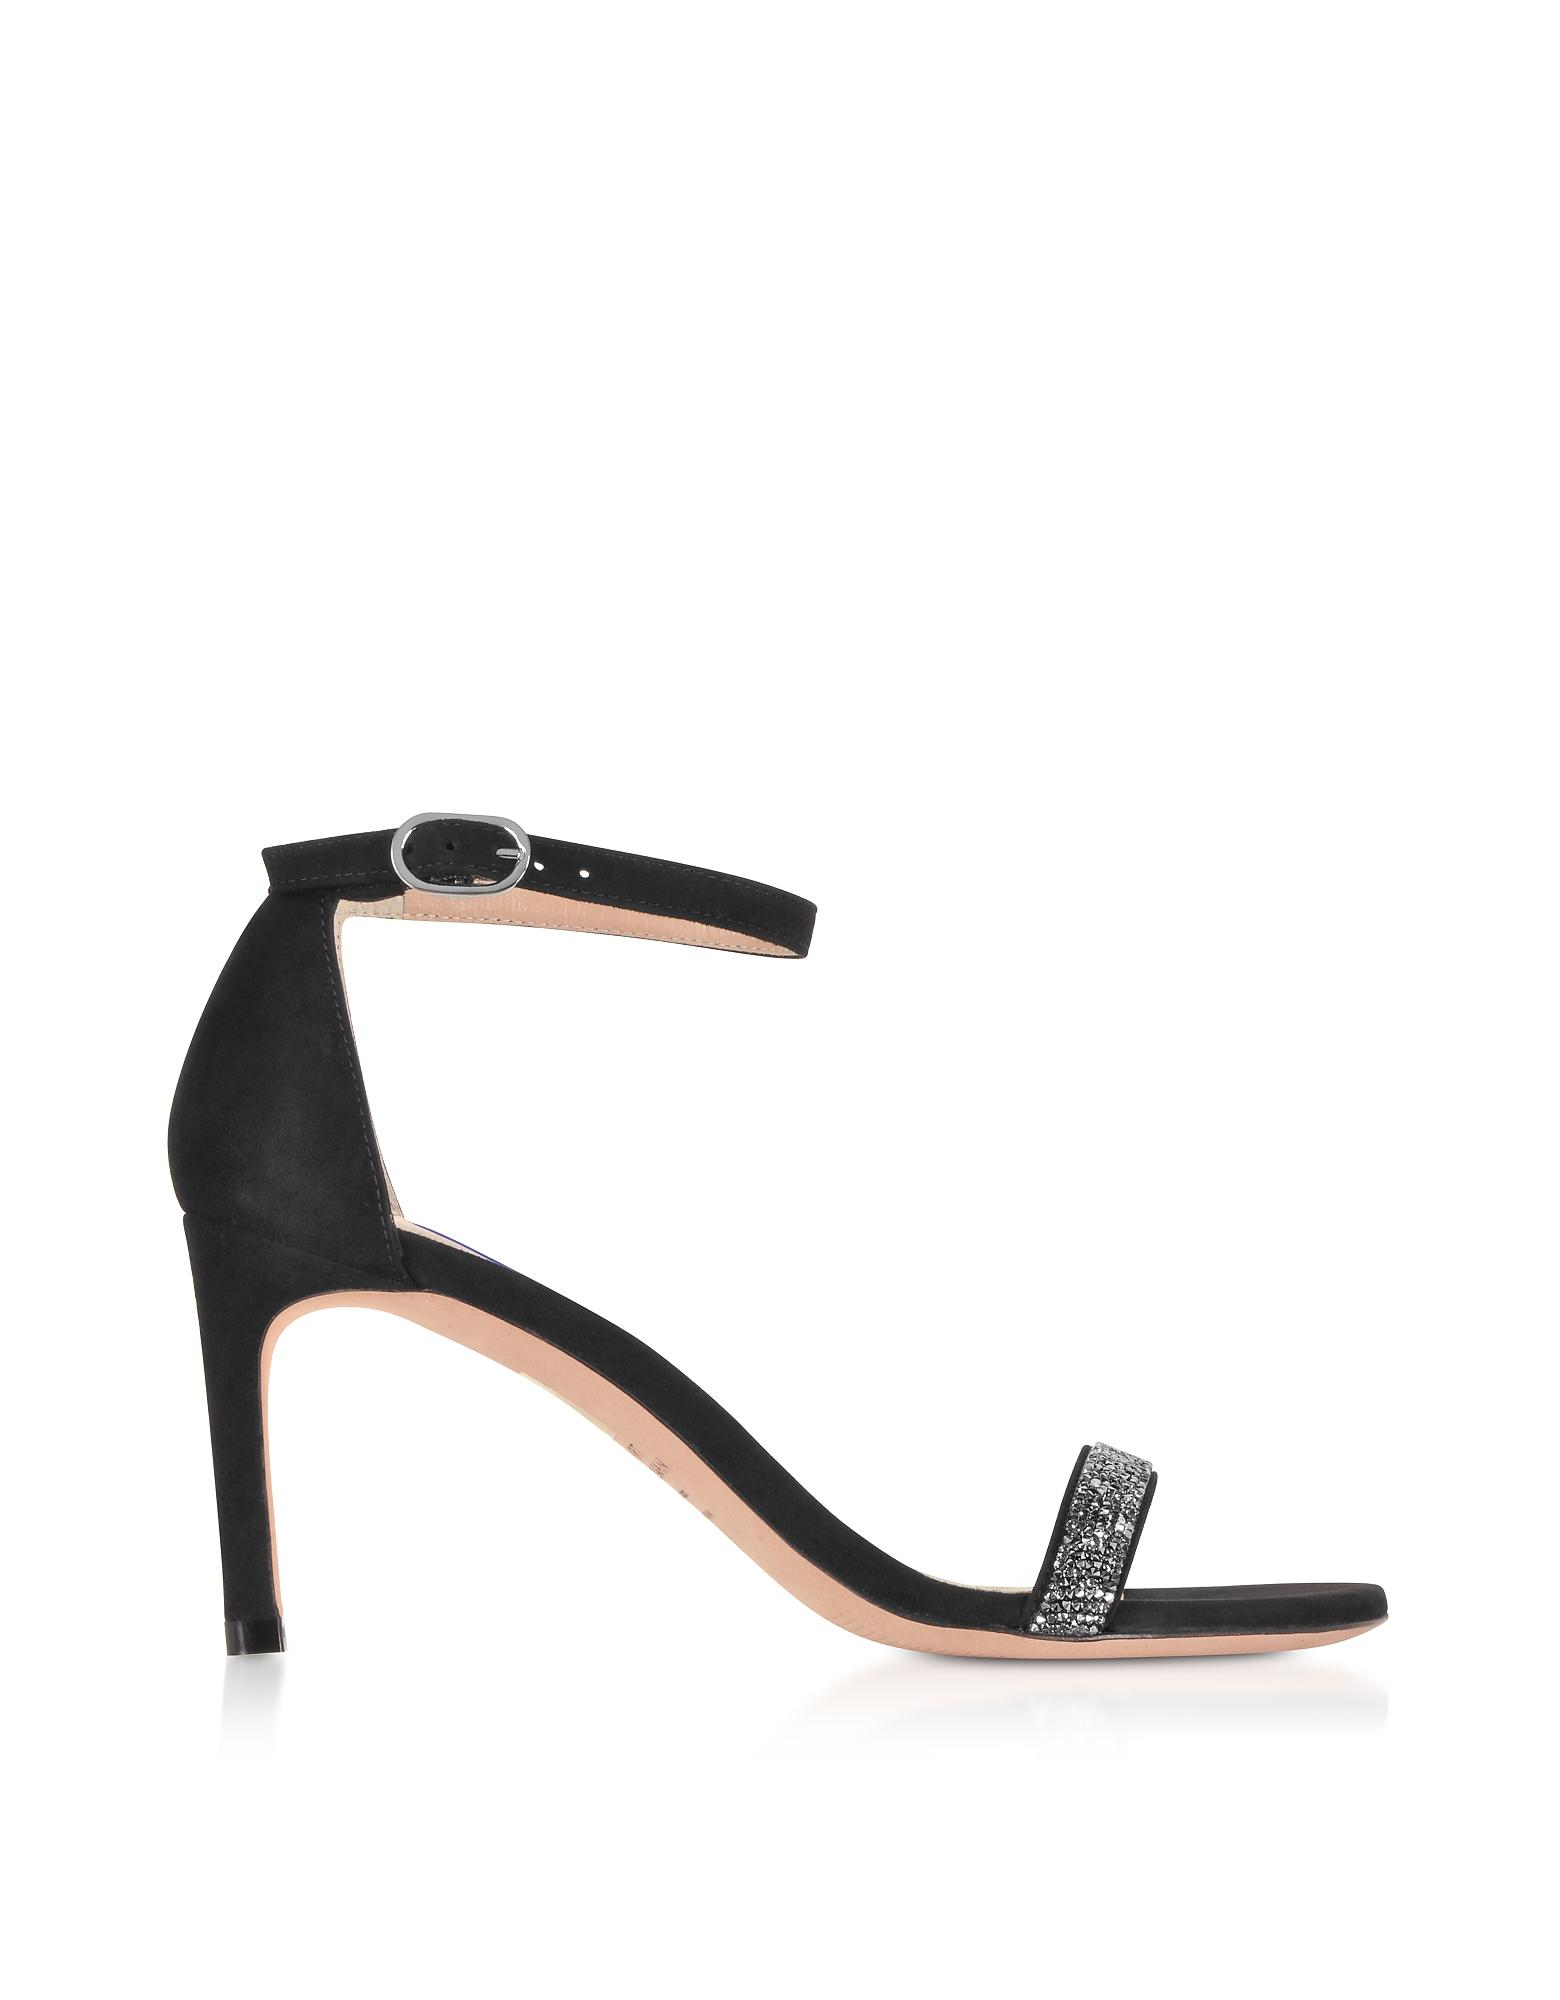 Nunakedstraight Black Suede and Crystals Mid-Heel Sandals